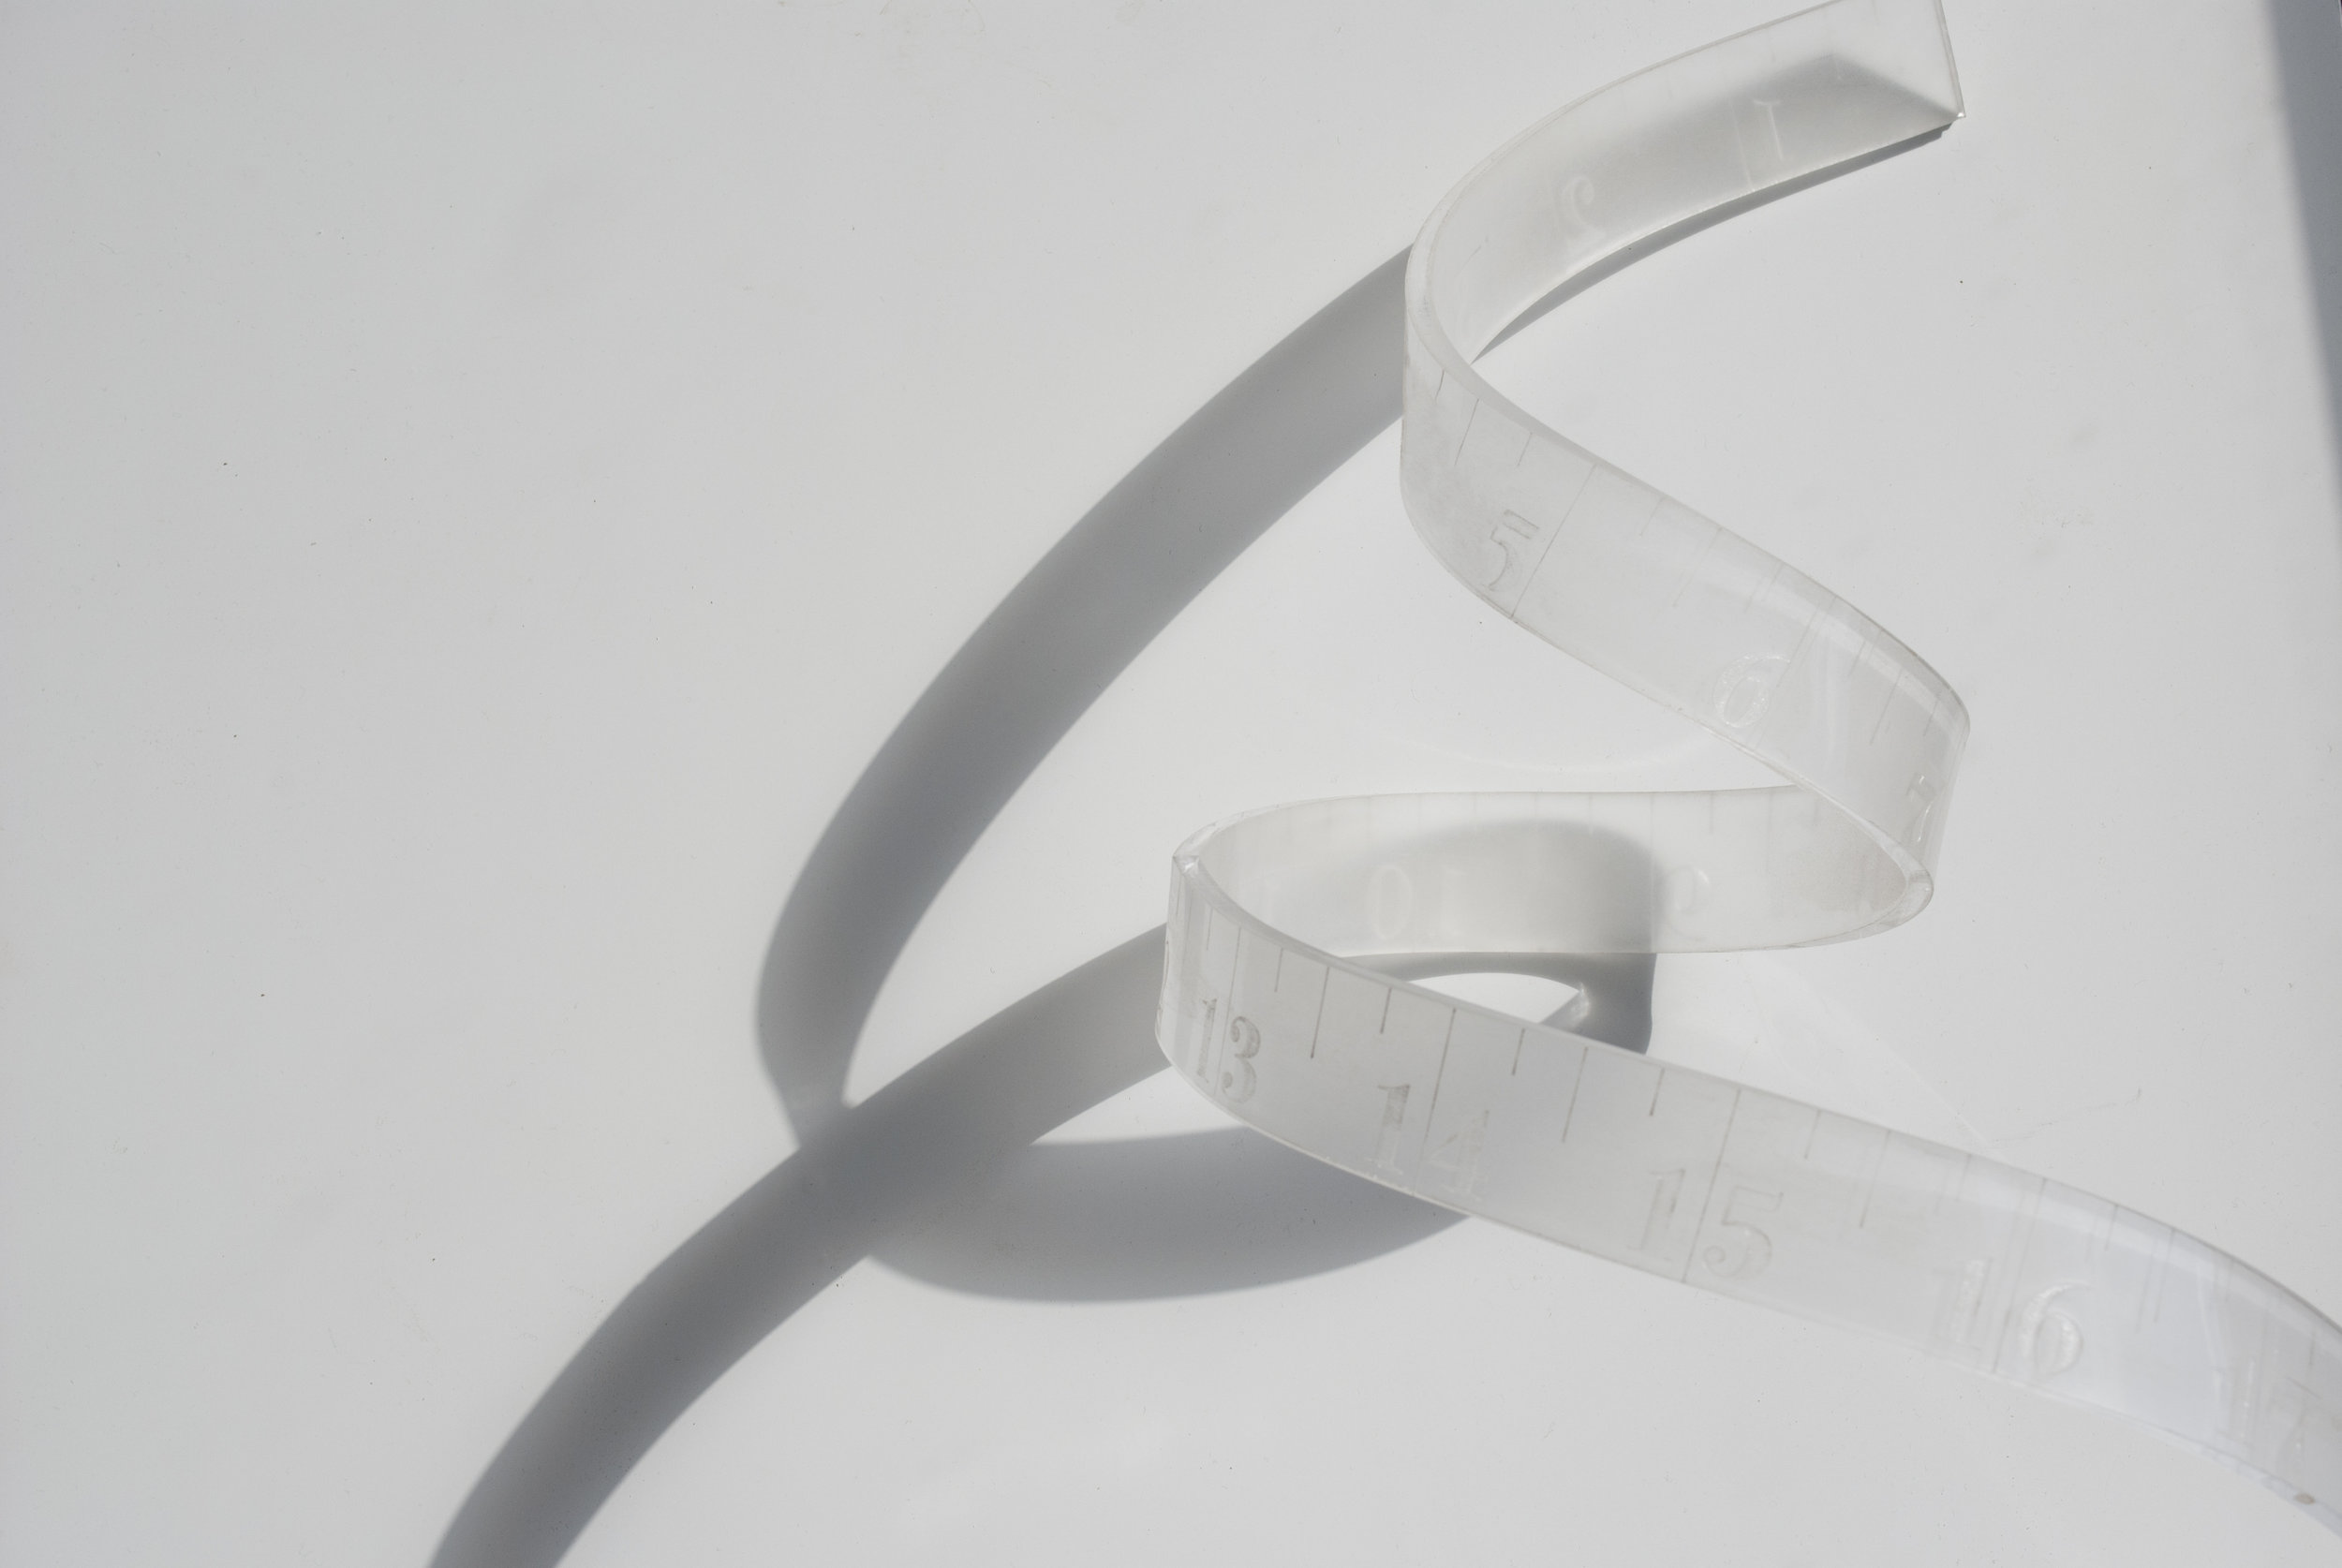 allstudio-acrylique-courbe.jpg